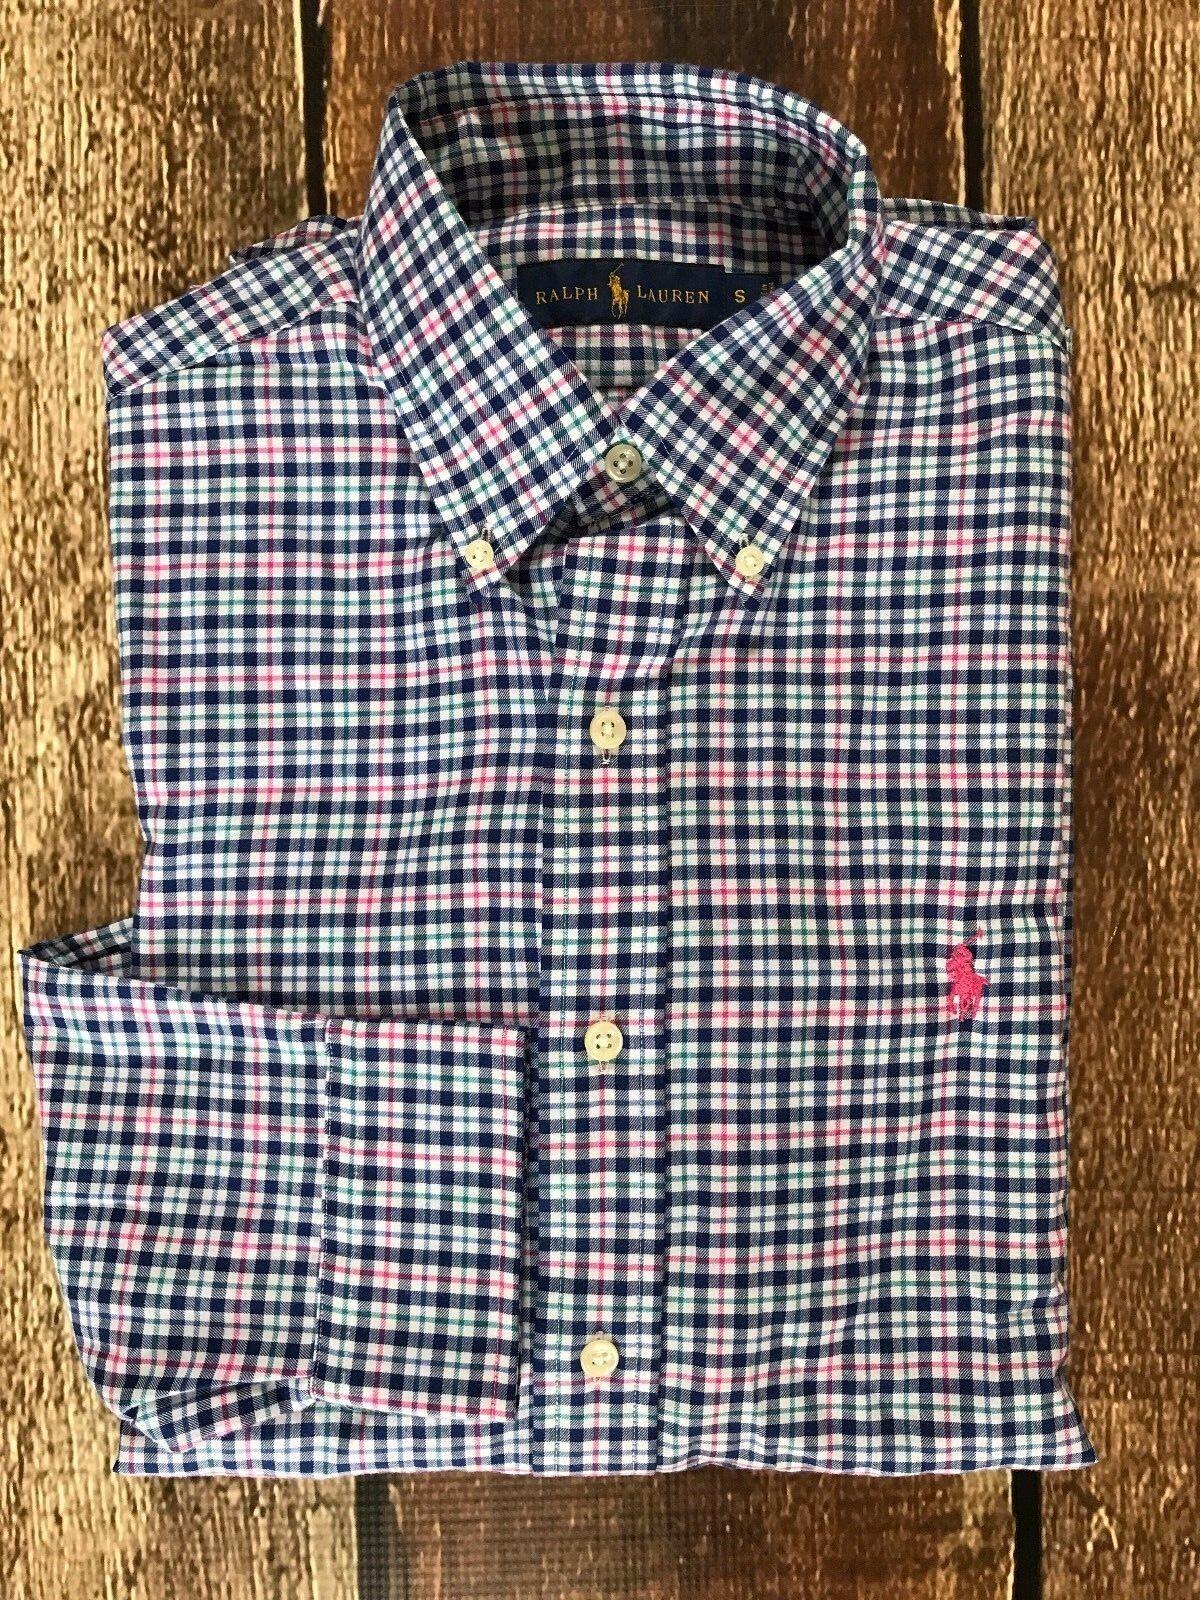 Polo Ralph Lauren Mens Plaid Twill Sport Shirt bluee Pink Green Mens Size Small